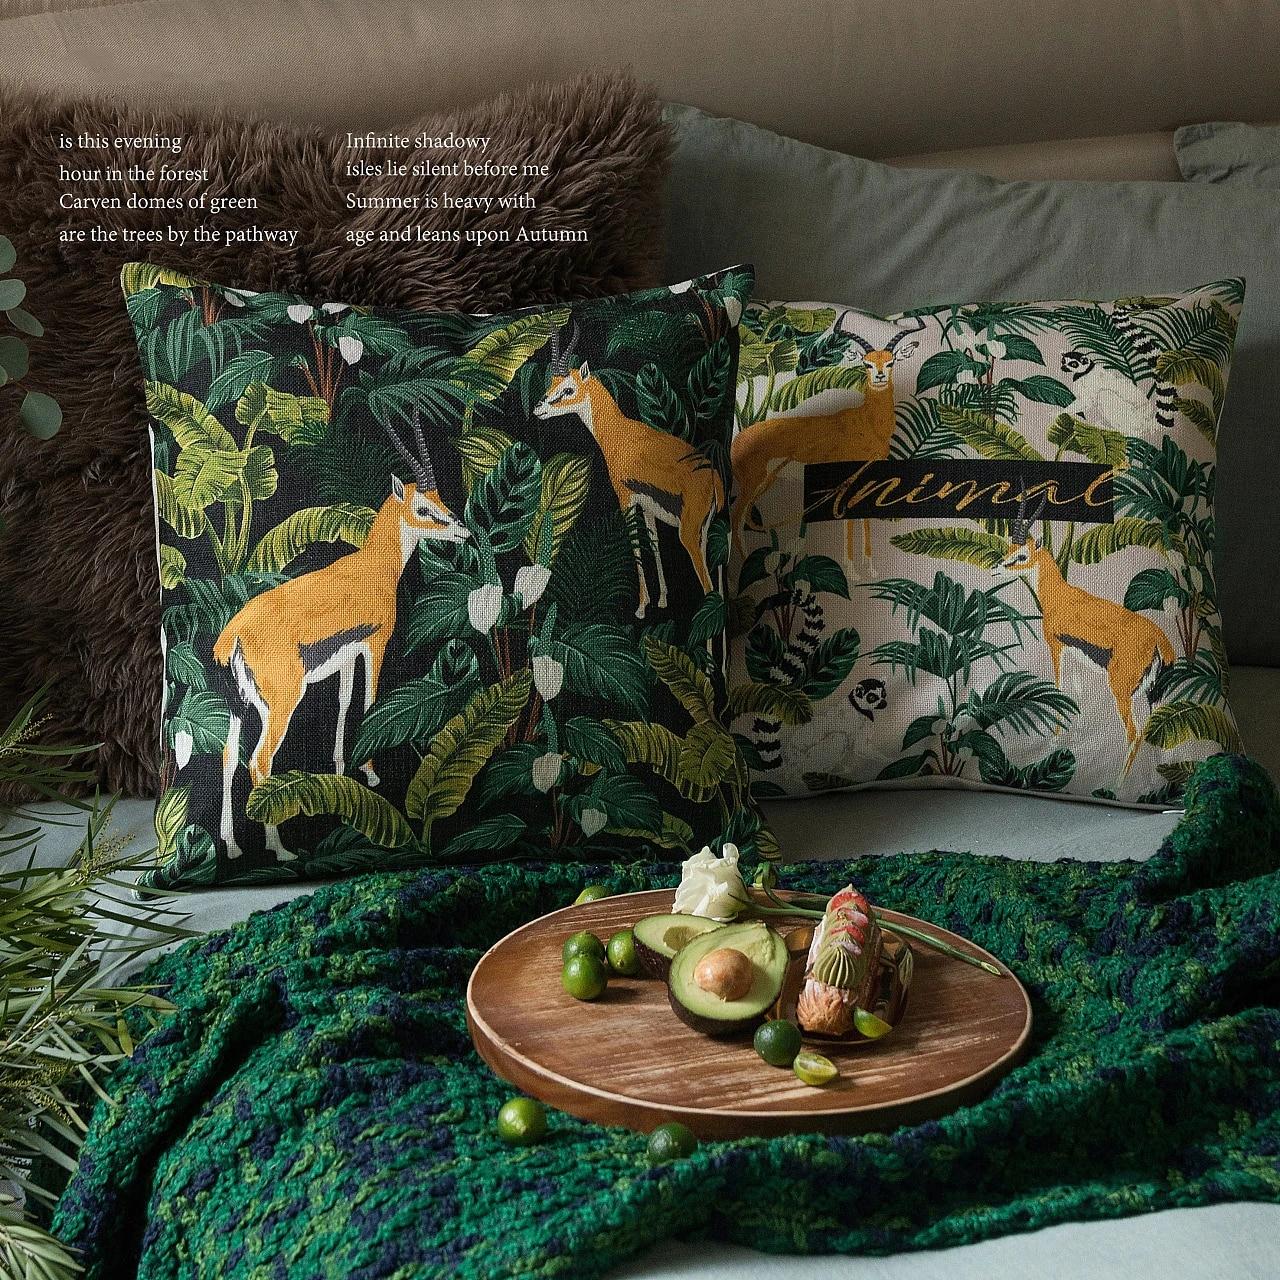 jungle lemur antelope print cushion cover 45 45cm cotton linen pillowcase throw pillow covers sofa decorative pillows home decor